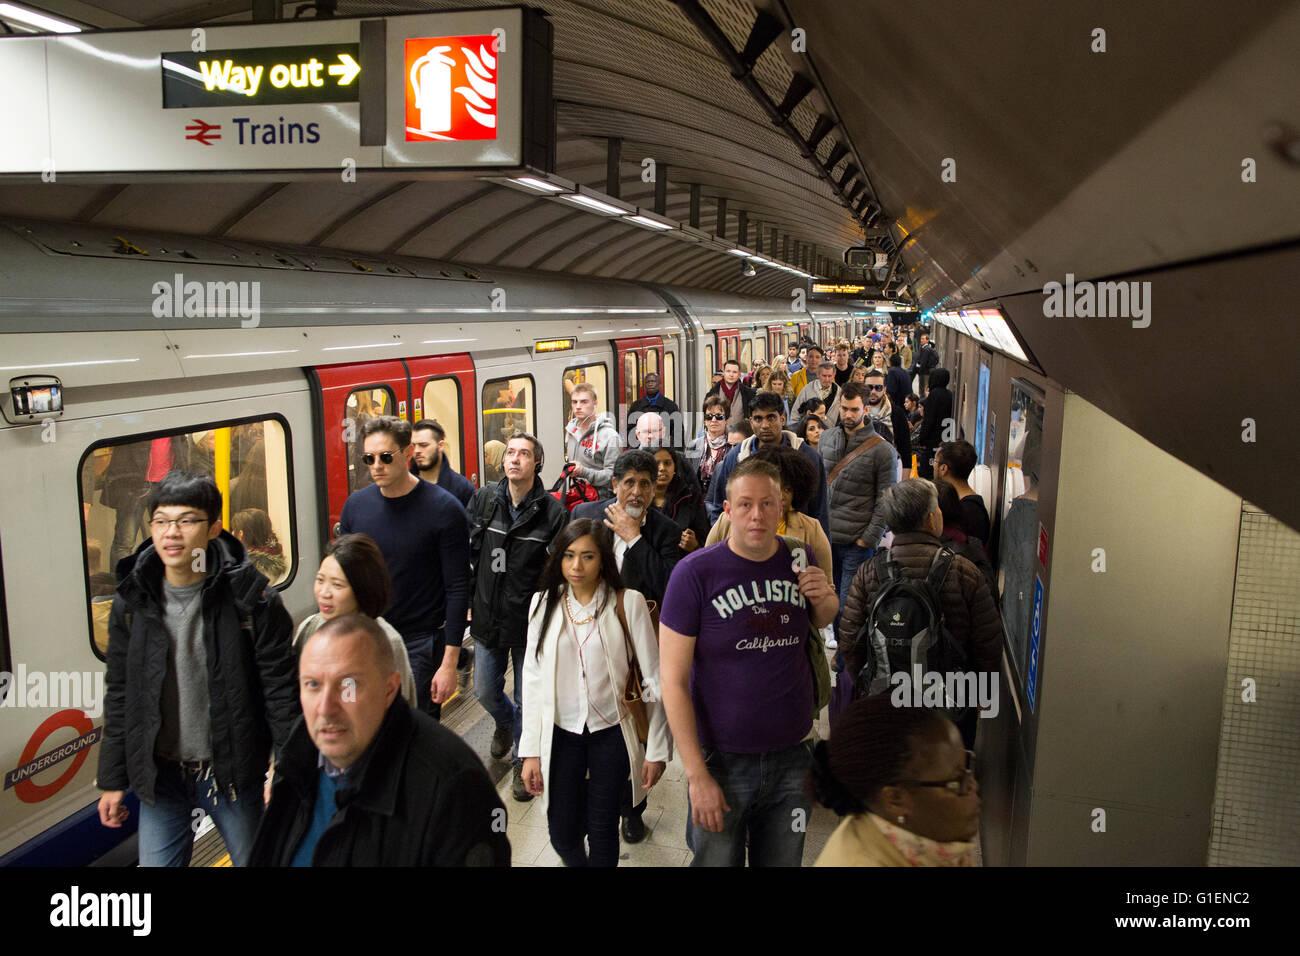 Rush Hour at Waterloo Tube Station on the London Underground, London, UK - Stock Image